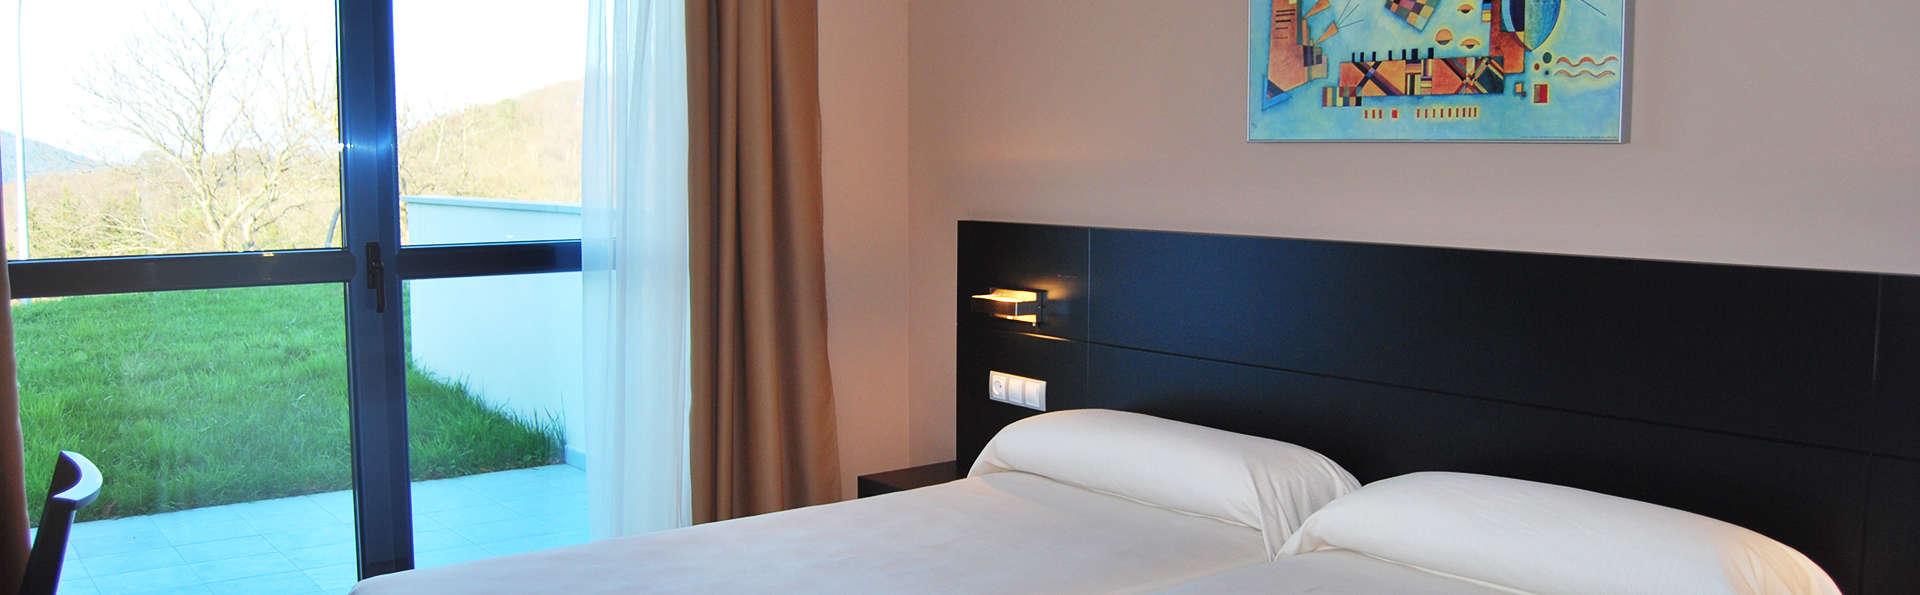 Hotel Parrilla El Zangano - EDIT_room2.jpg